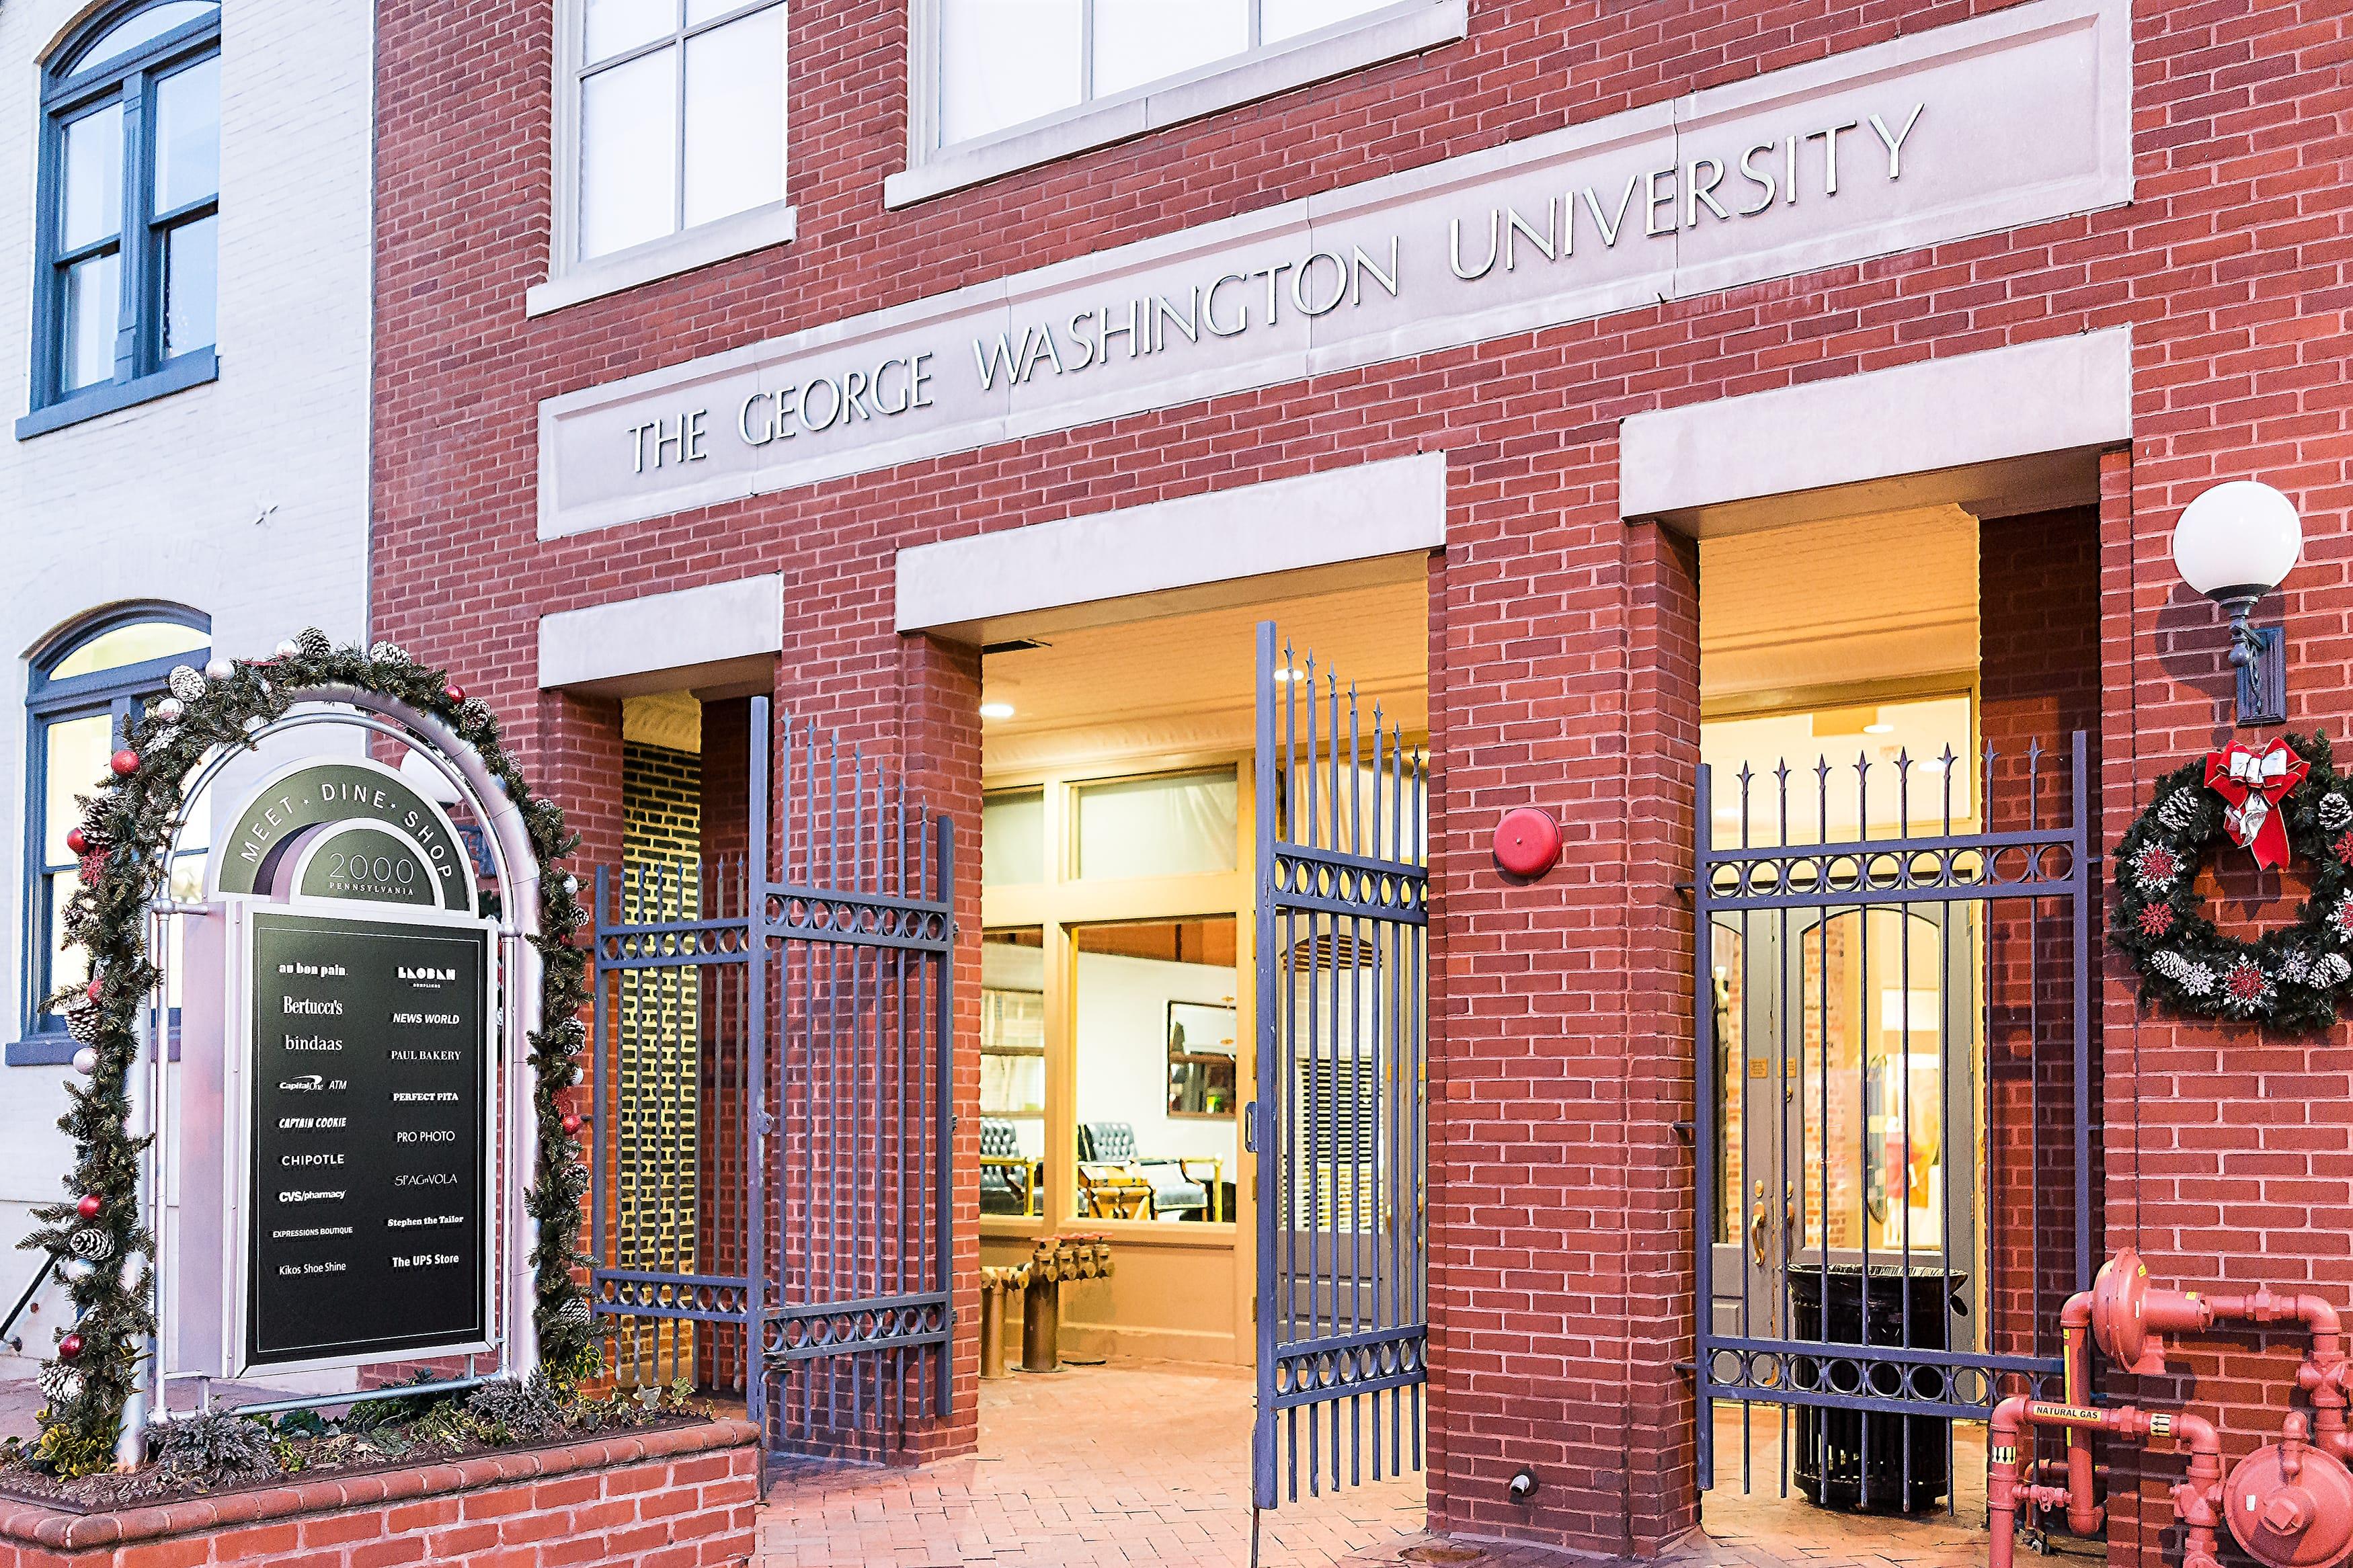 Dissertation editing services washington dc